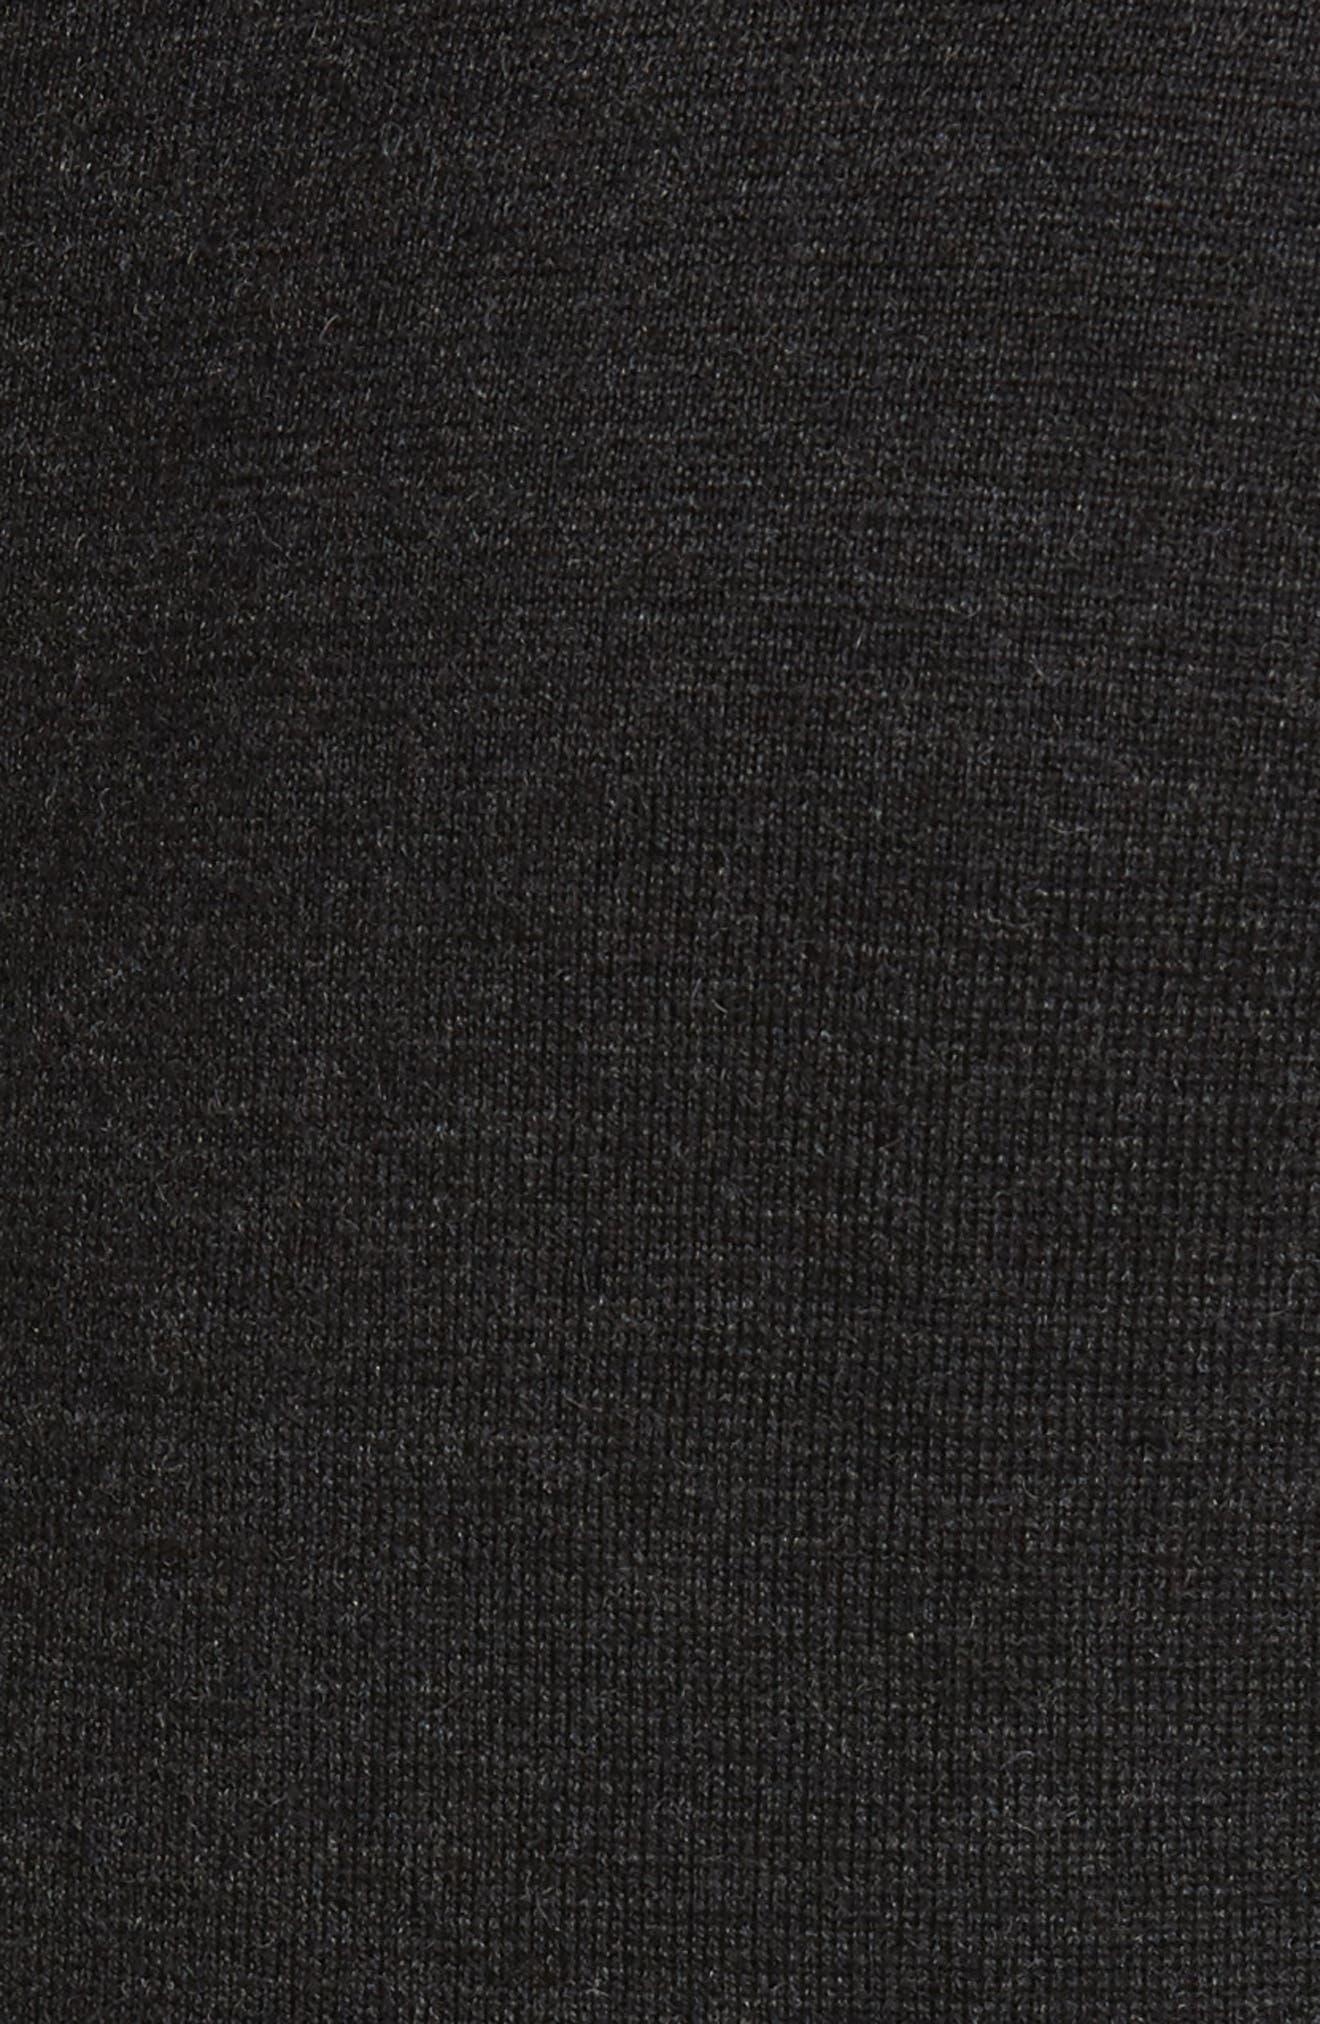 Carmichael Full Zip Merino Wool Hoodie,                             Alternate thumbnail 5, color,                             041